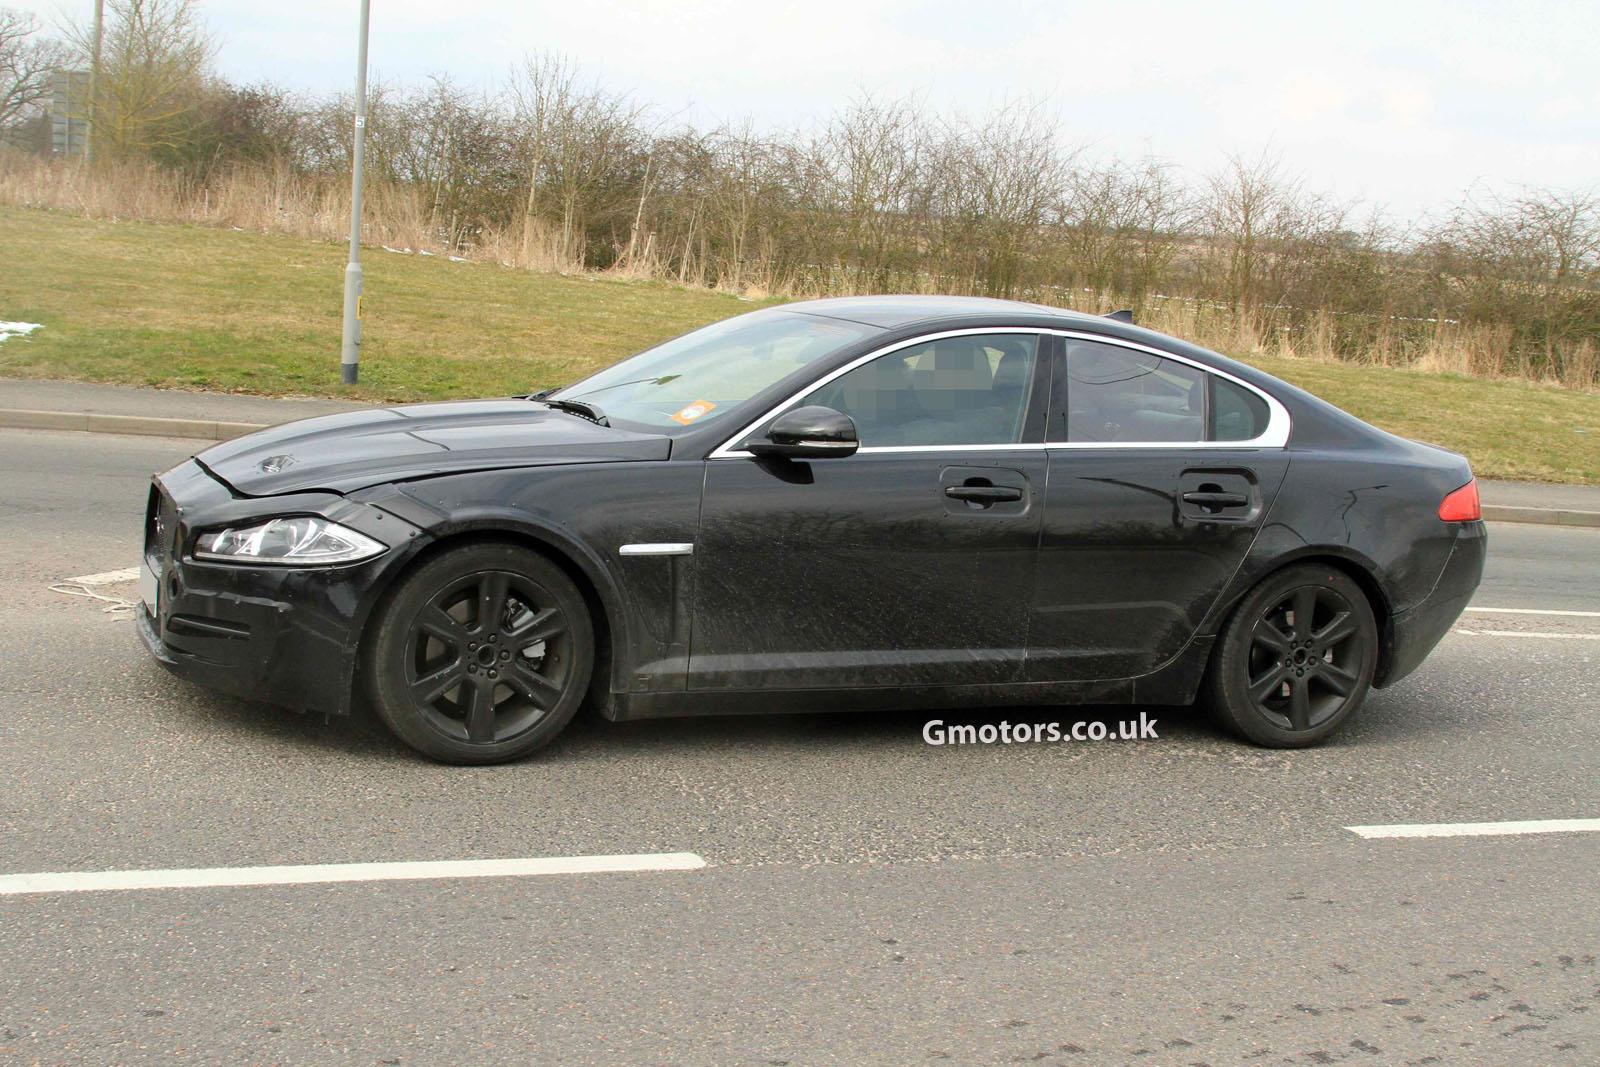 New: Next 2015 Jaguar XS